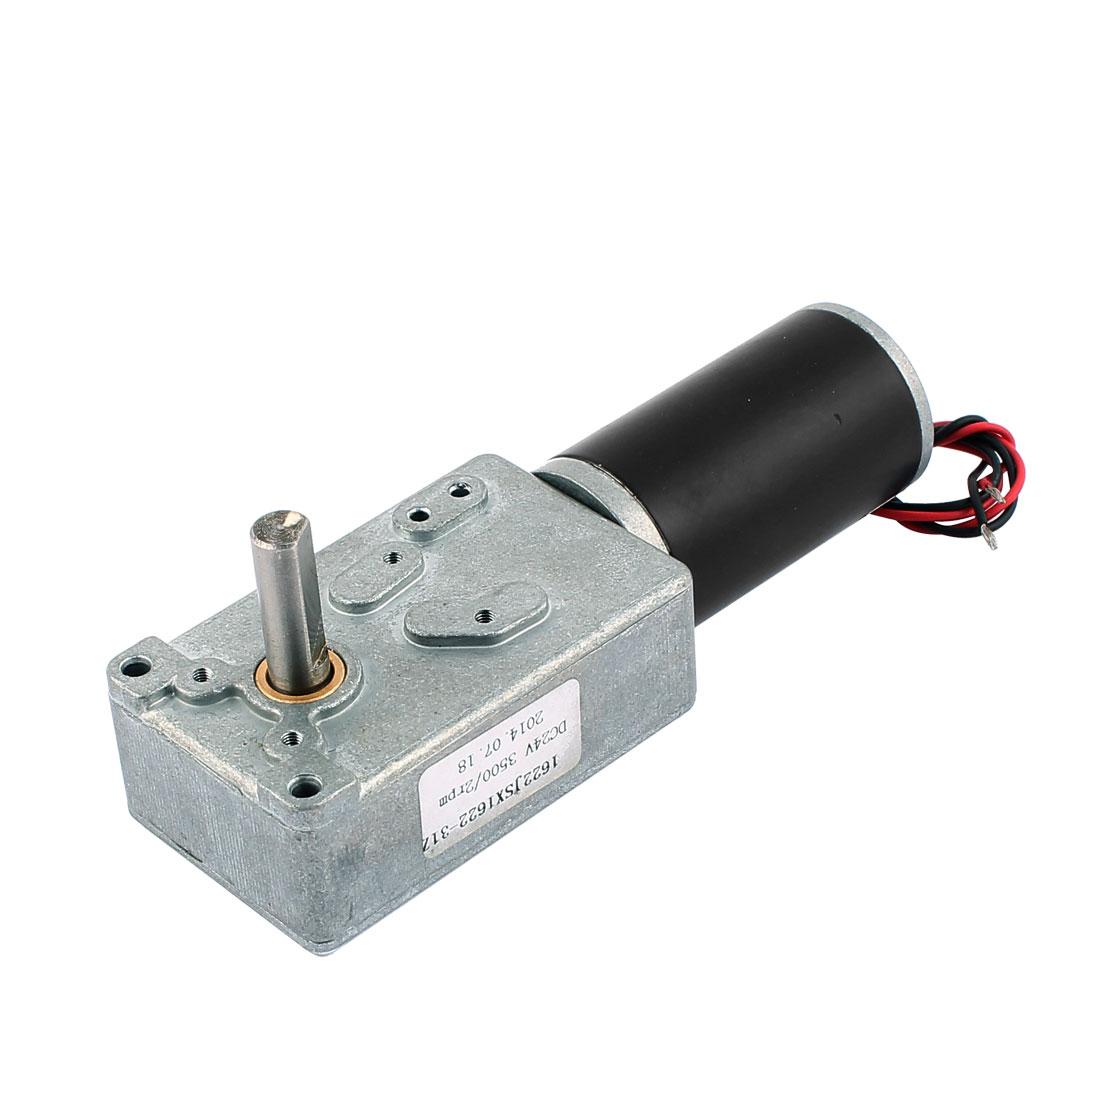 1622JSX1622-31ZY DC 24V 3500/2rpm Rectangle Reducer Gear Box Electric Motor